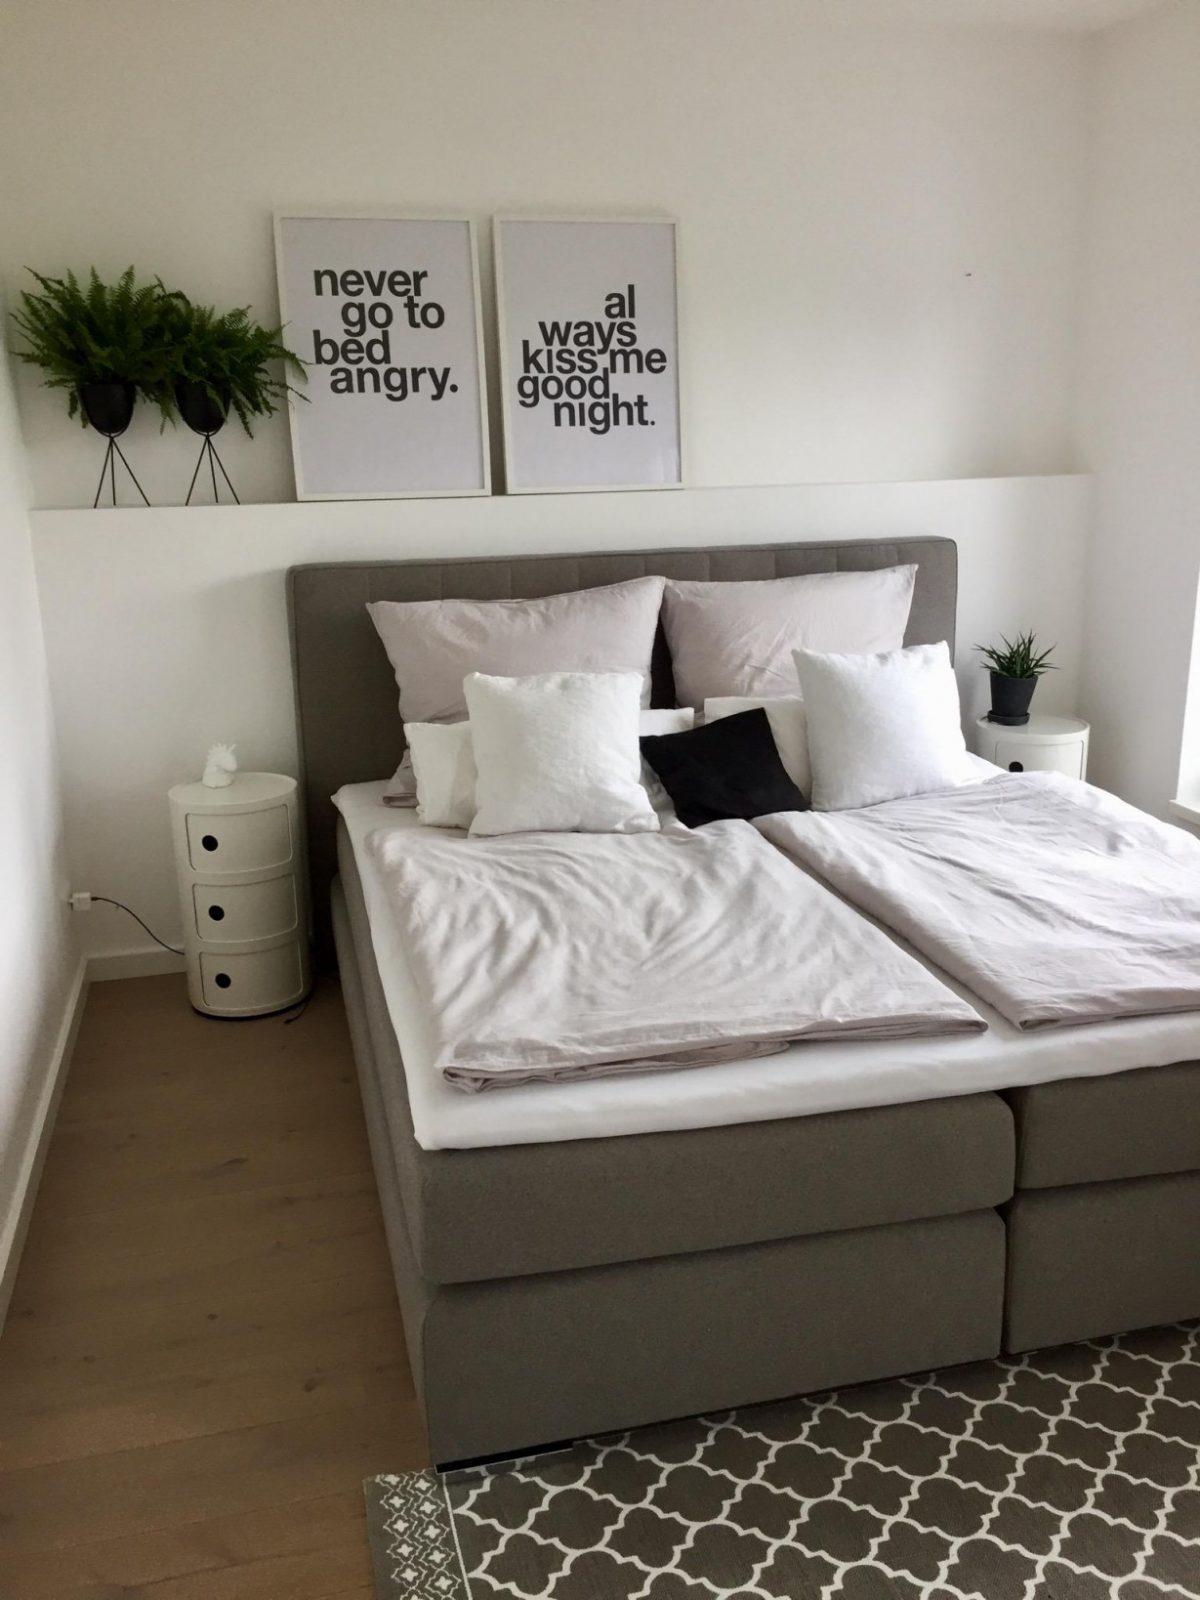 Boxspringbettideen Lass Dich Inspirieren von Schlafzimmer Ideen Mit Boxspringbett Bild